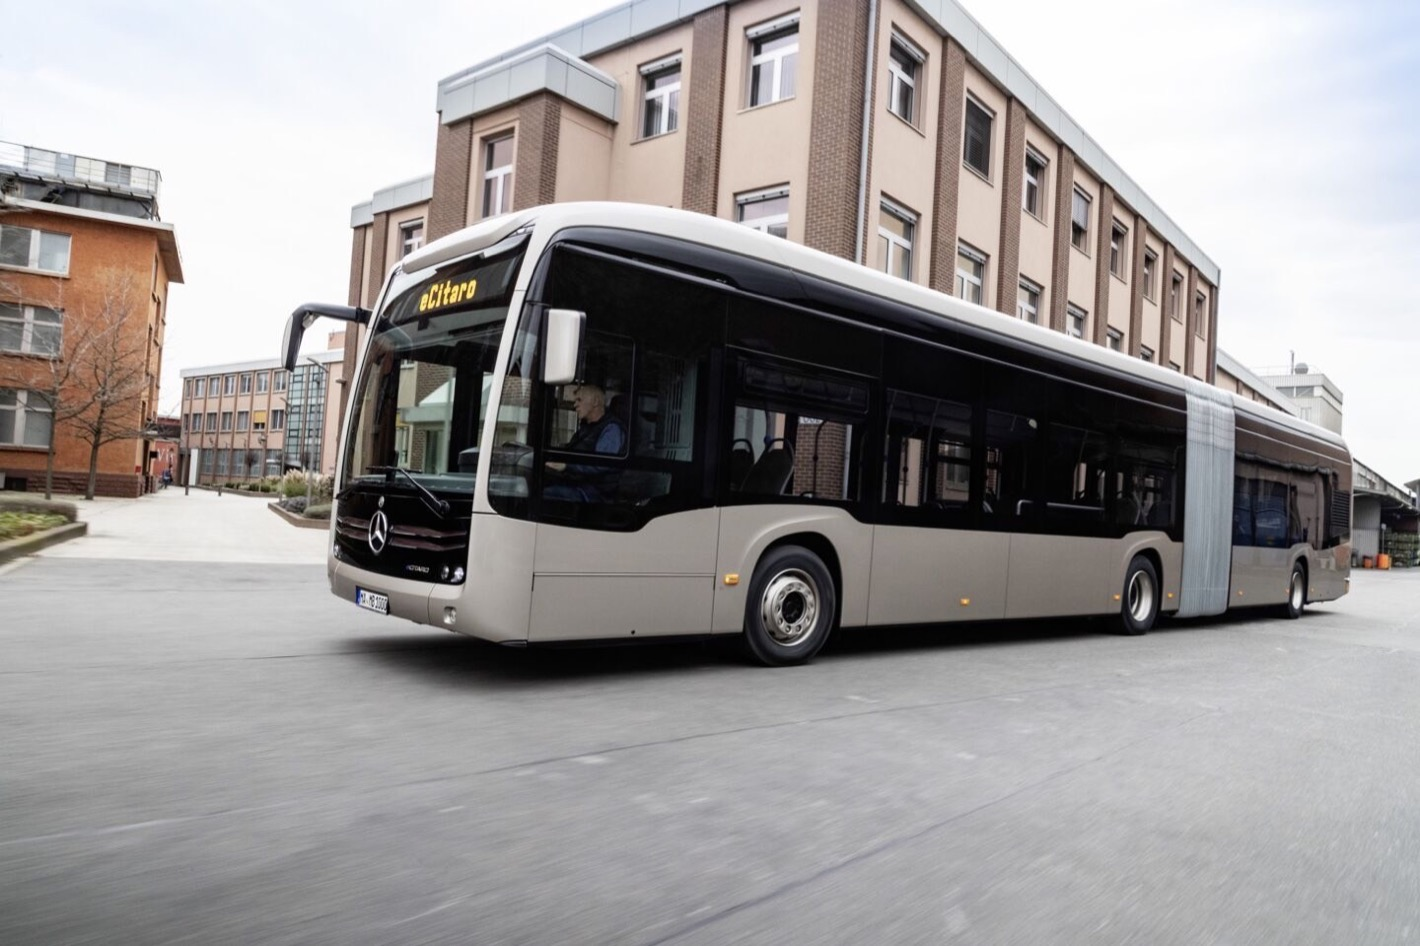 Mercedes-Benz eCitaro G mit vollelektrischem Antrieb, Exterieur, rauchsilber metallic, 2 x elektrischer Radnabenmotor, 2 x 125 kW, 2 x 485 Nm, 7 Festkörperbatterien, 63 kWh pro Festkörperbatterie, Preventive Brake Assist, Sideguard Assist, LED-Scheinwerfer, Länge/Breite/Höhe: 18.125 /2.550/3.400mm, Beförderungskapazität: 1/157 Mercedes-Benz eCitaro G with all-electric drive, exterior, smoke silver metallic, 2 x electric hub motor, 2 x 125 kW, 2 x 485 Nm, 7 solid-state batteries, 63 kWh per solid-state battery, Preventive Brake Assist, Sideguard Assist, LED headlamps, length/width/height: 18.125 /2550/3400mm, passenger capacity: 1/157.